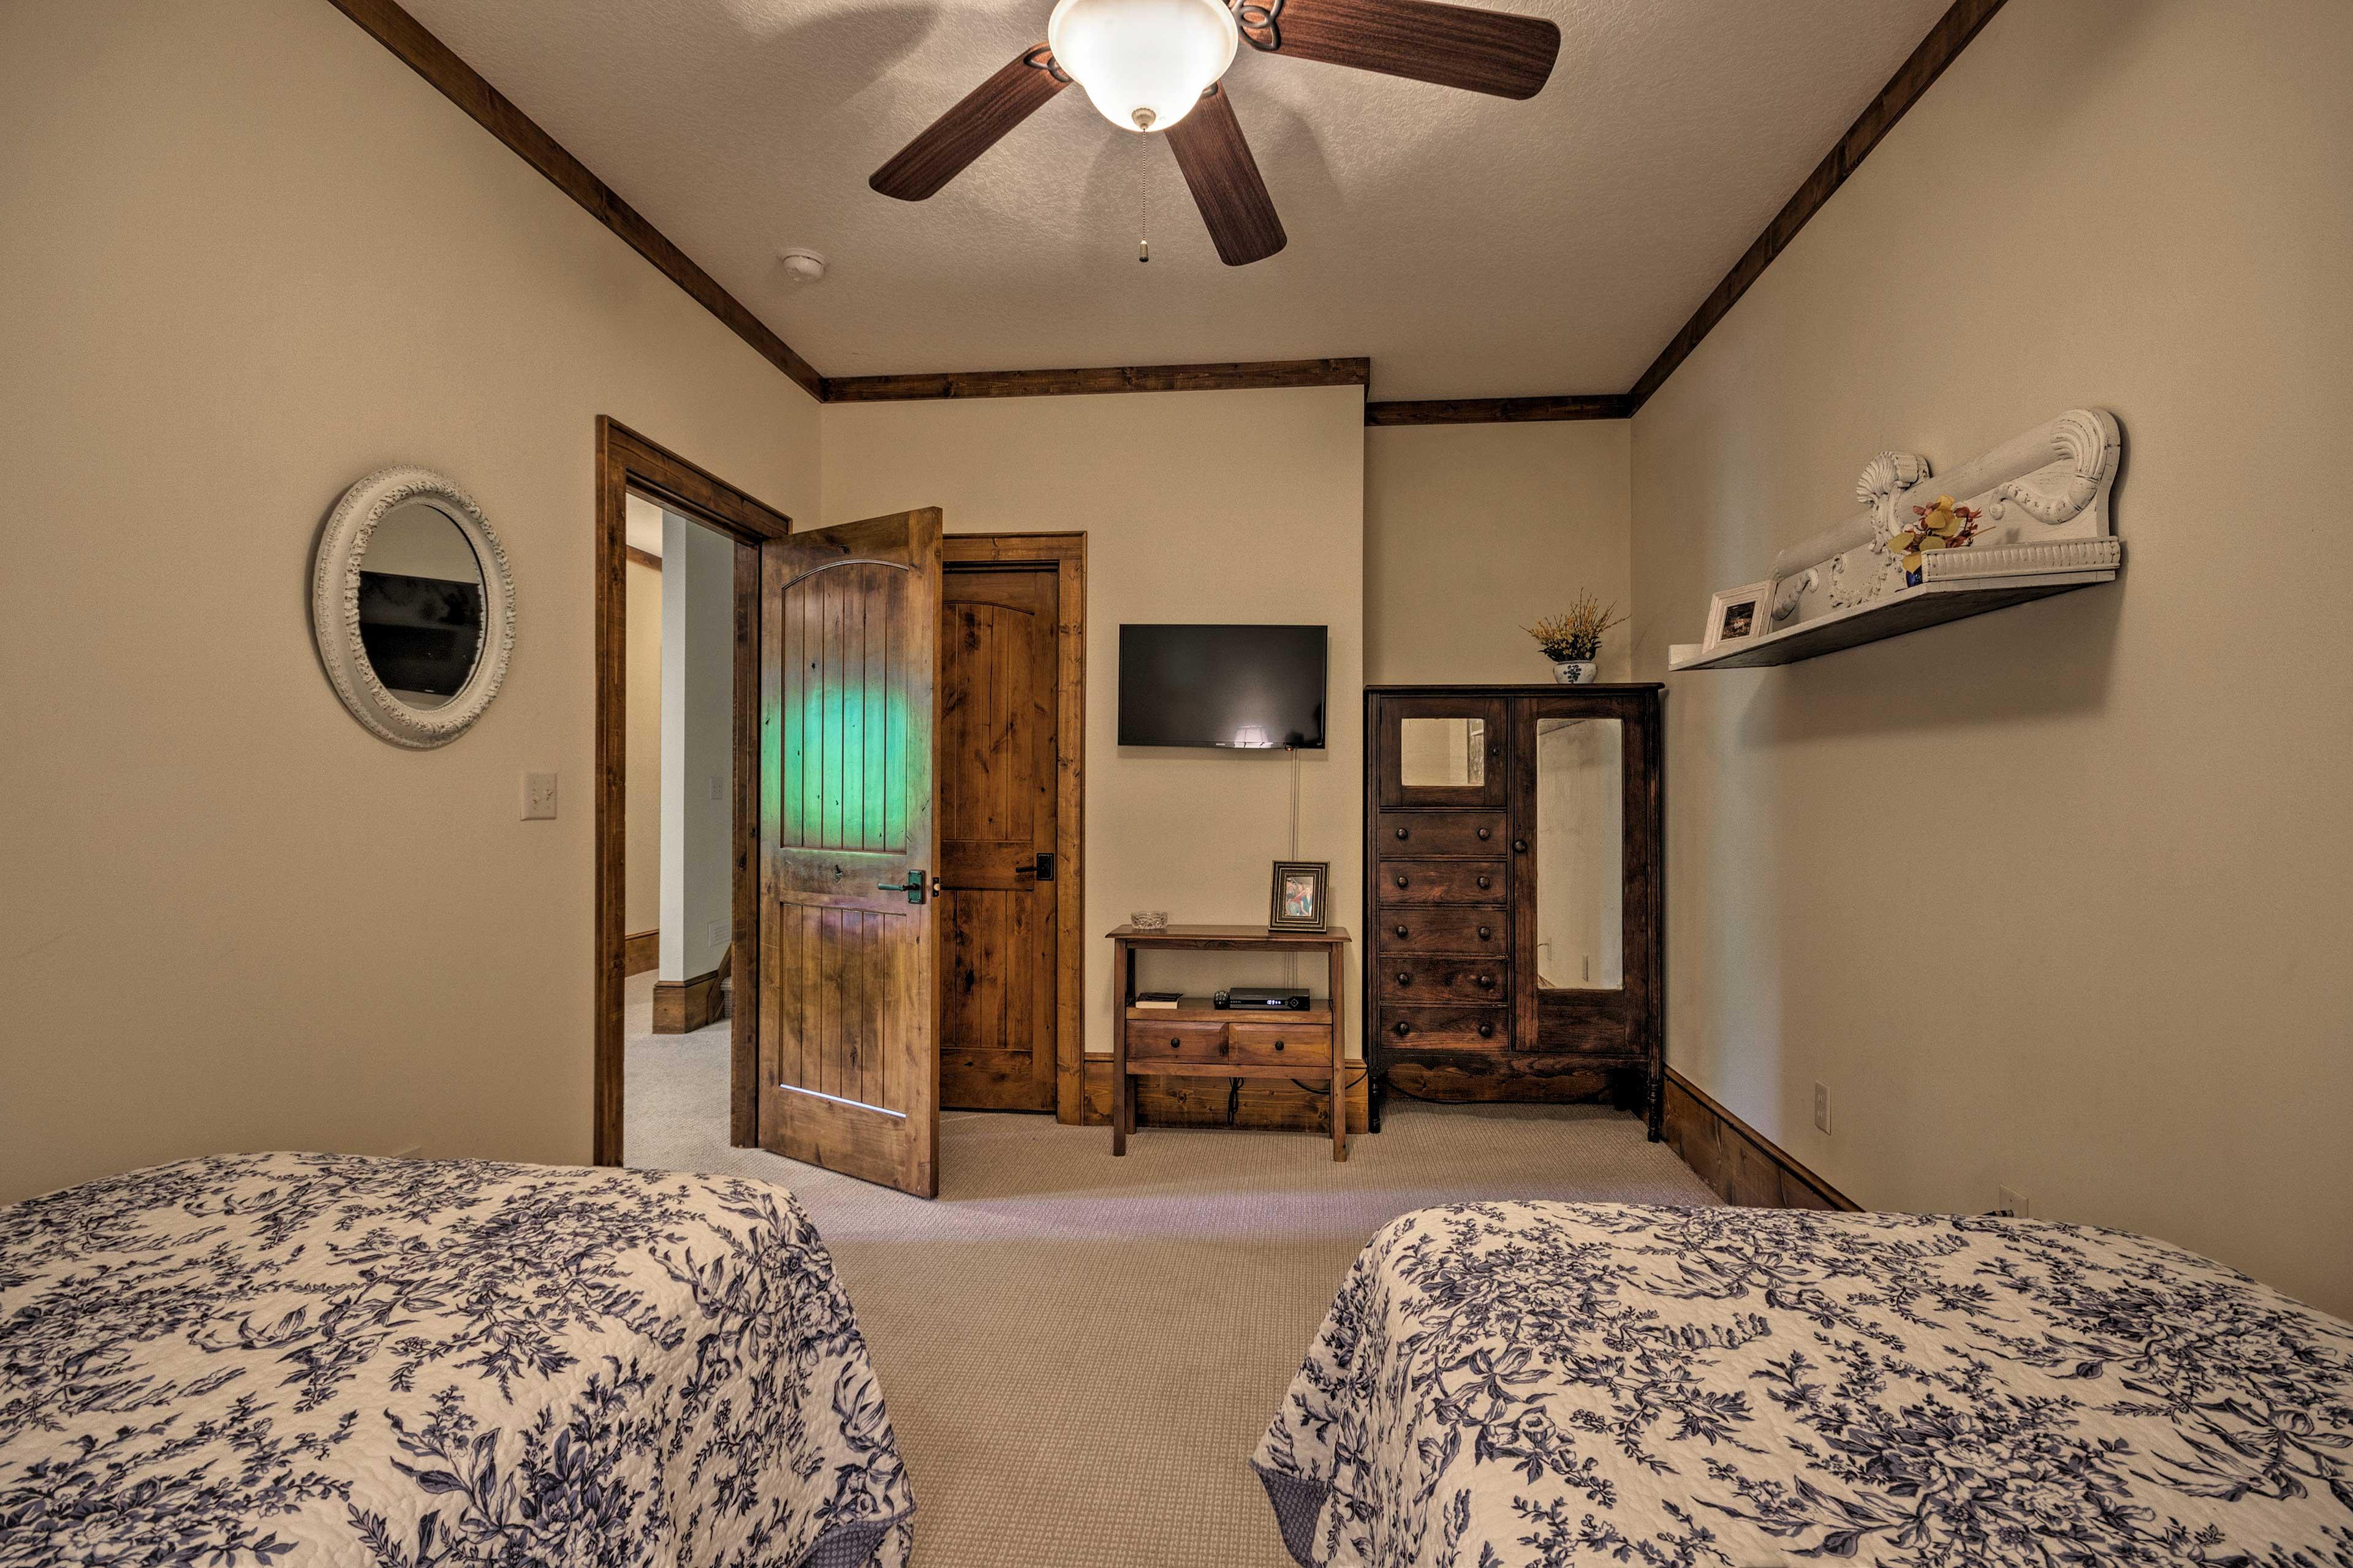 The home boasts a flat-screen Smart TV.